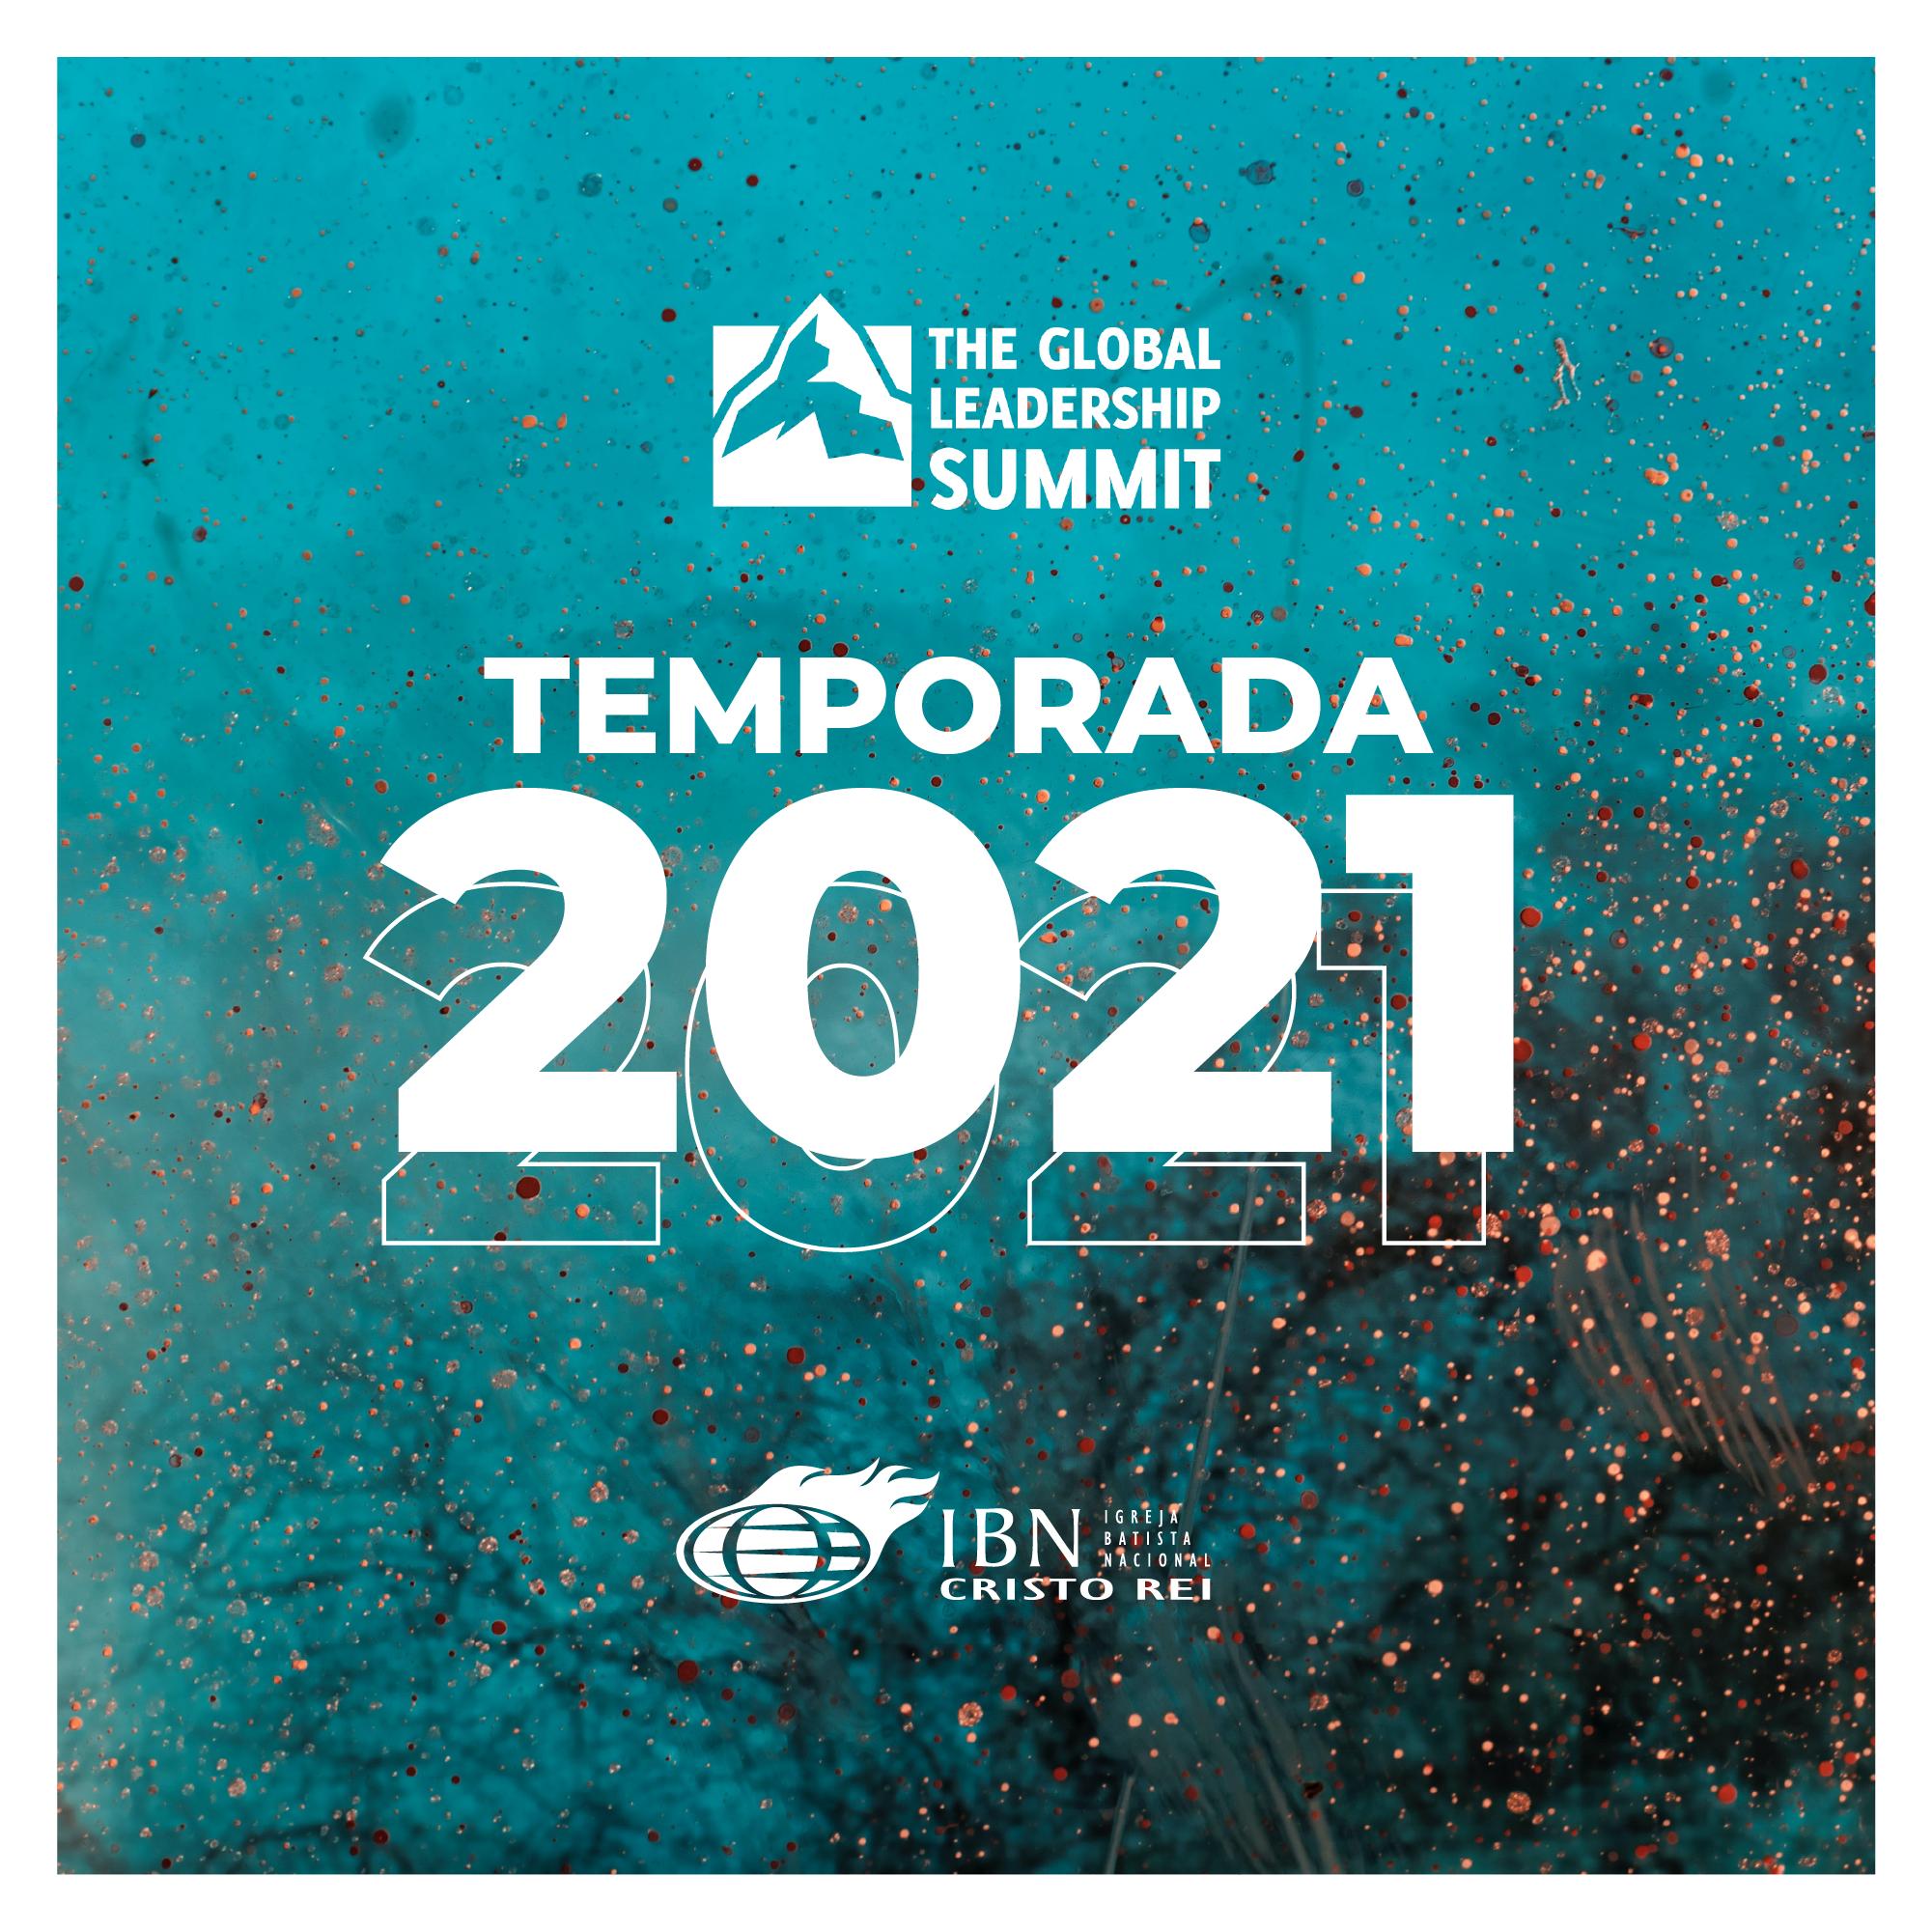 SUMMIT - TEMPORADA 2021